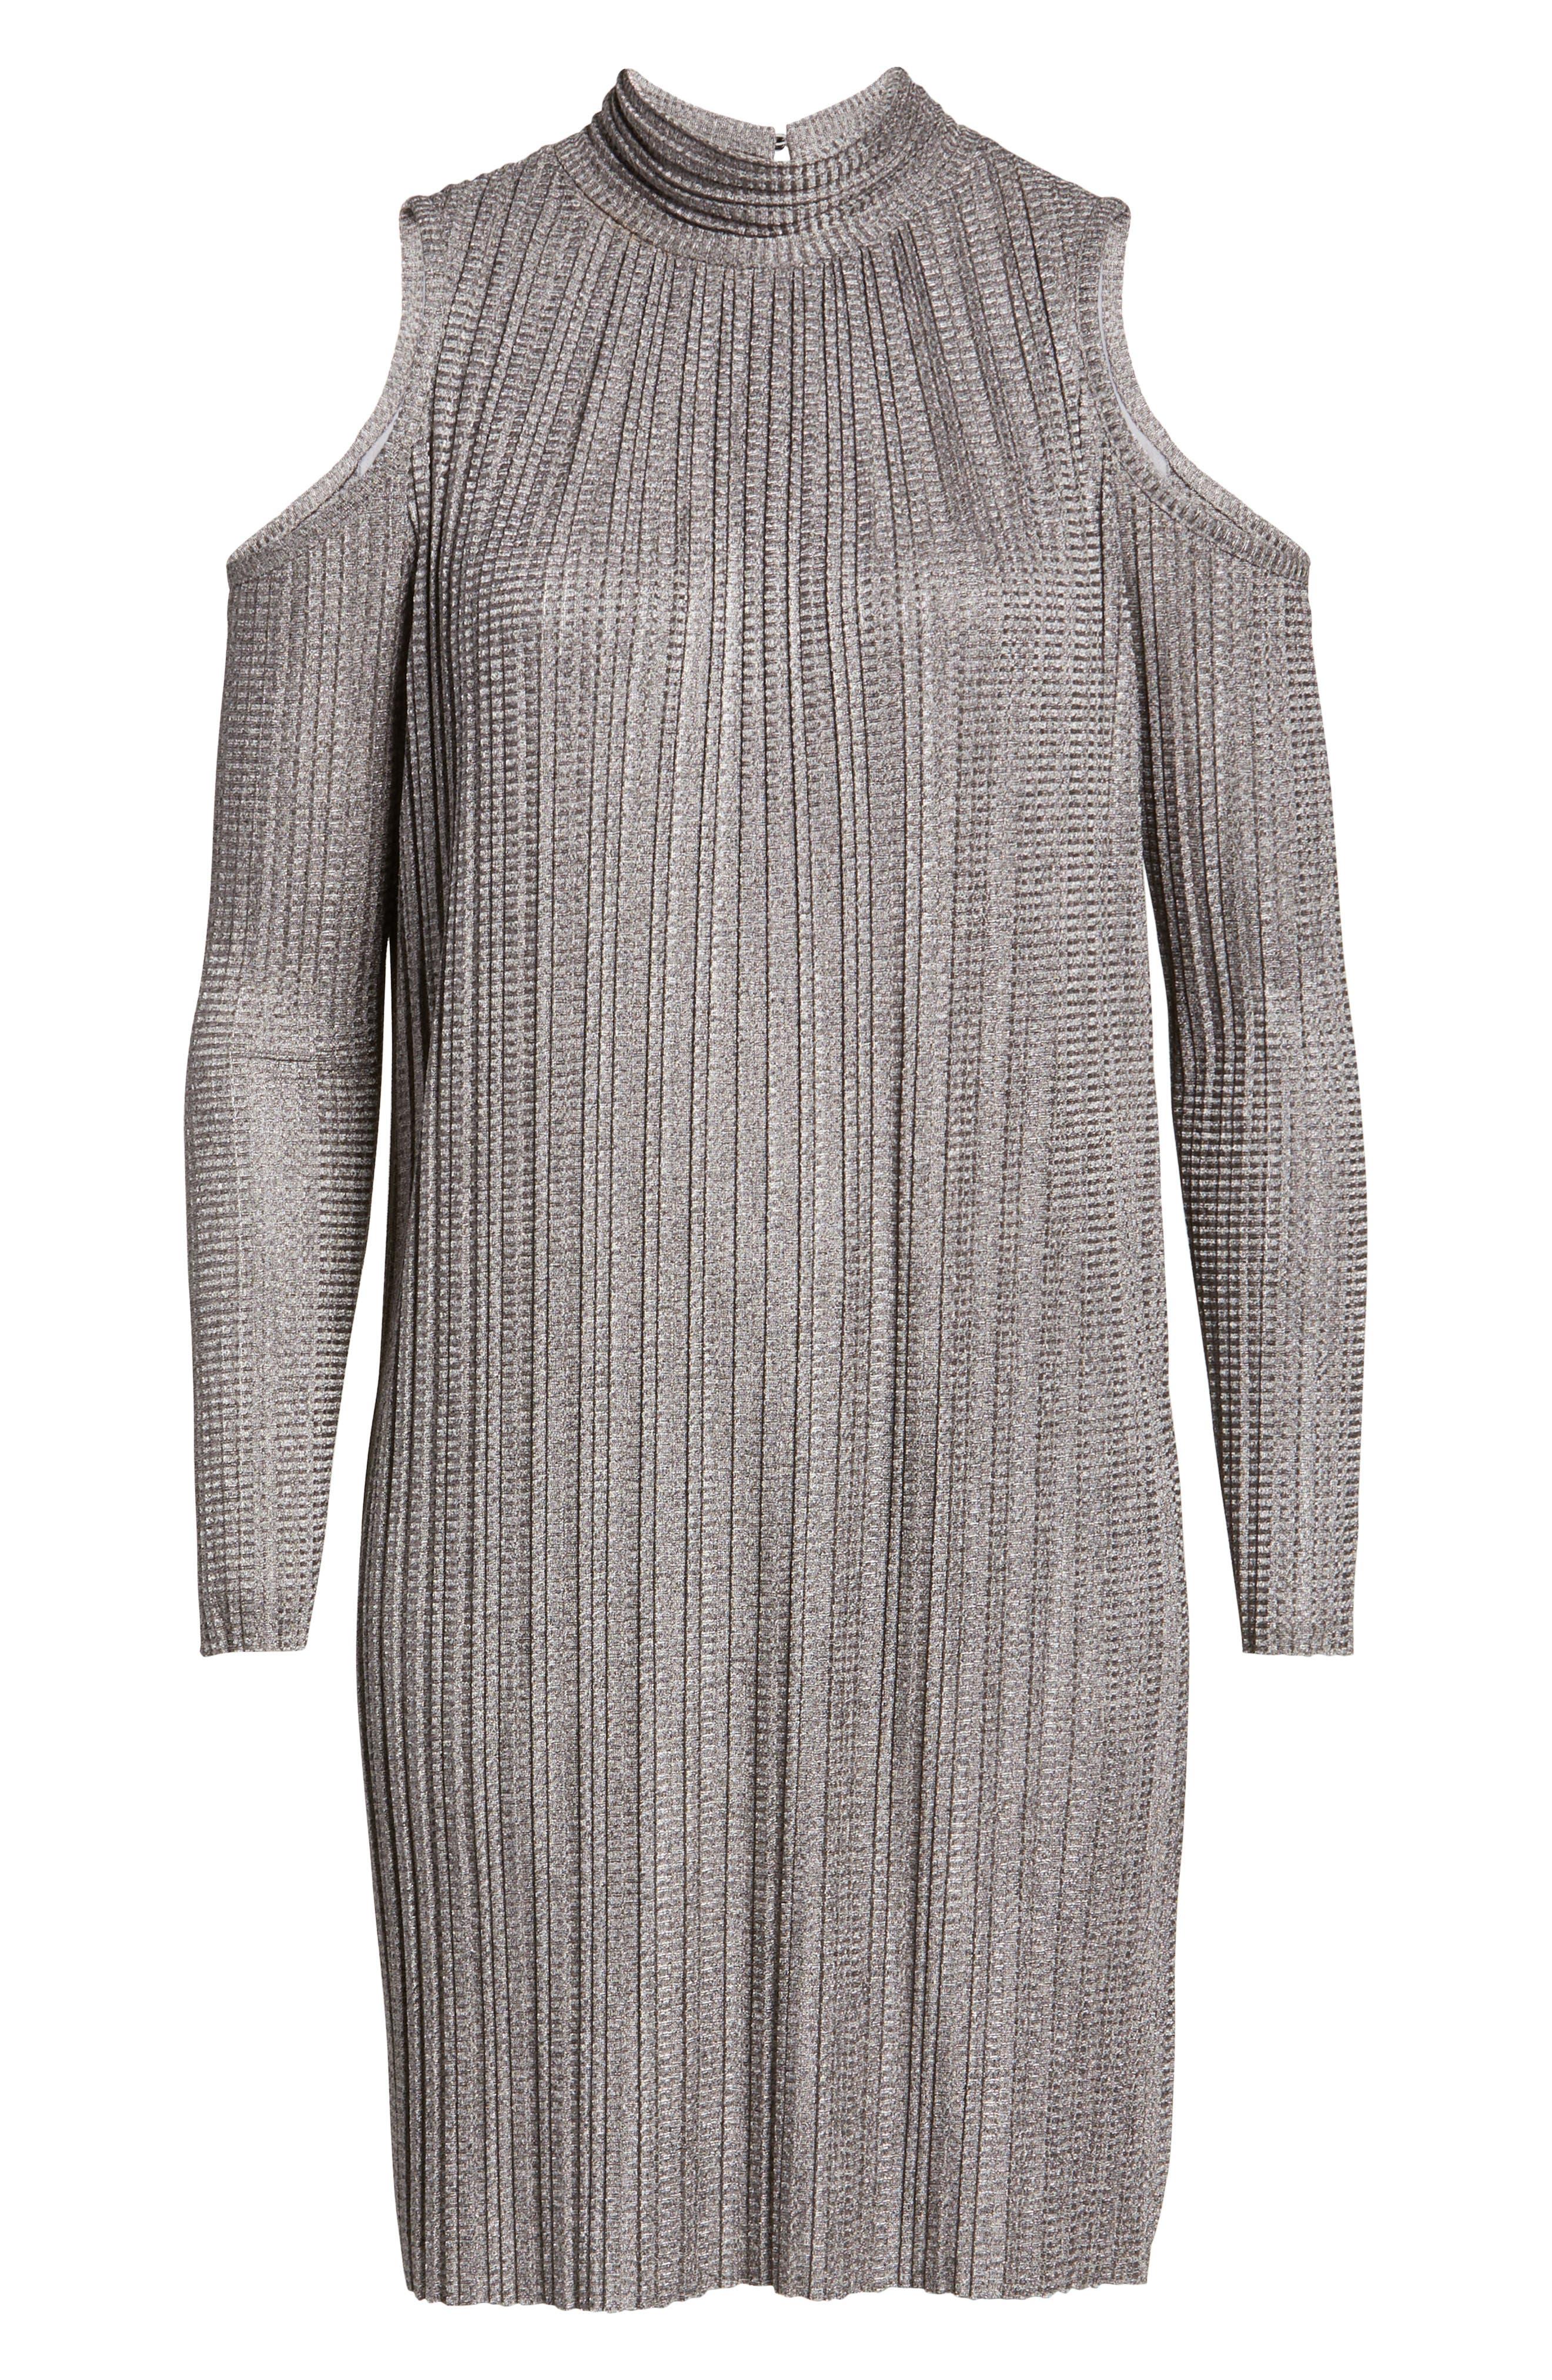 Cold Shoulder Pleated Shift Dress,                             Alternate thumbnail 6, color,                             685